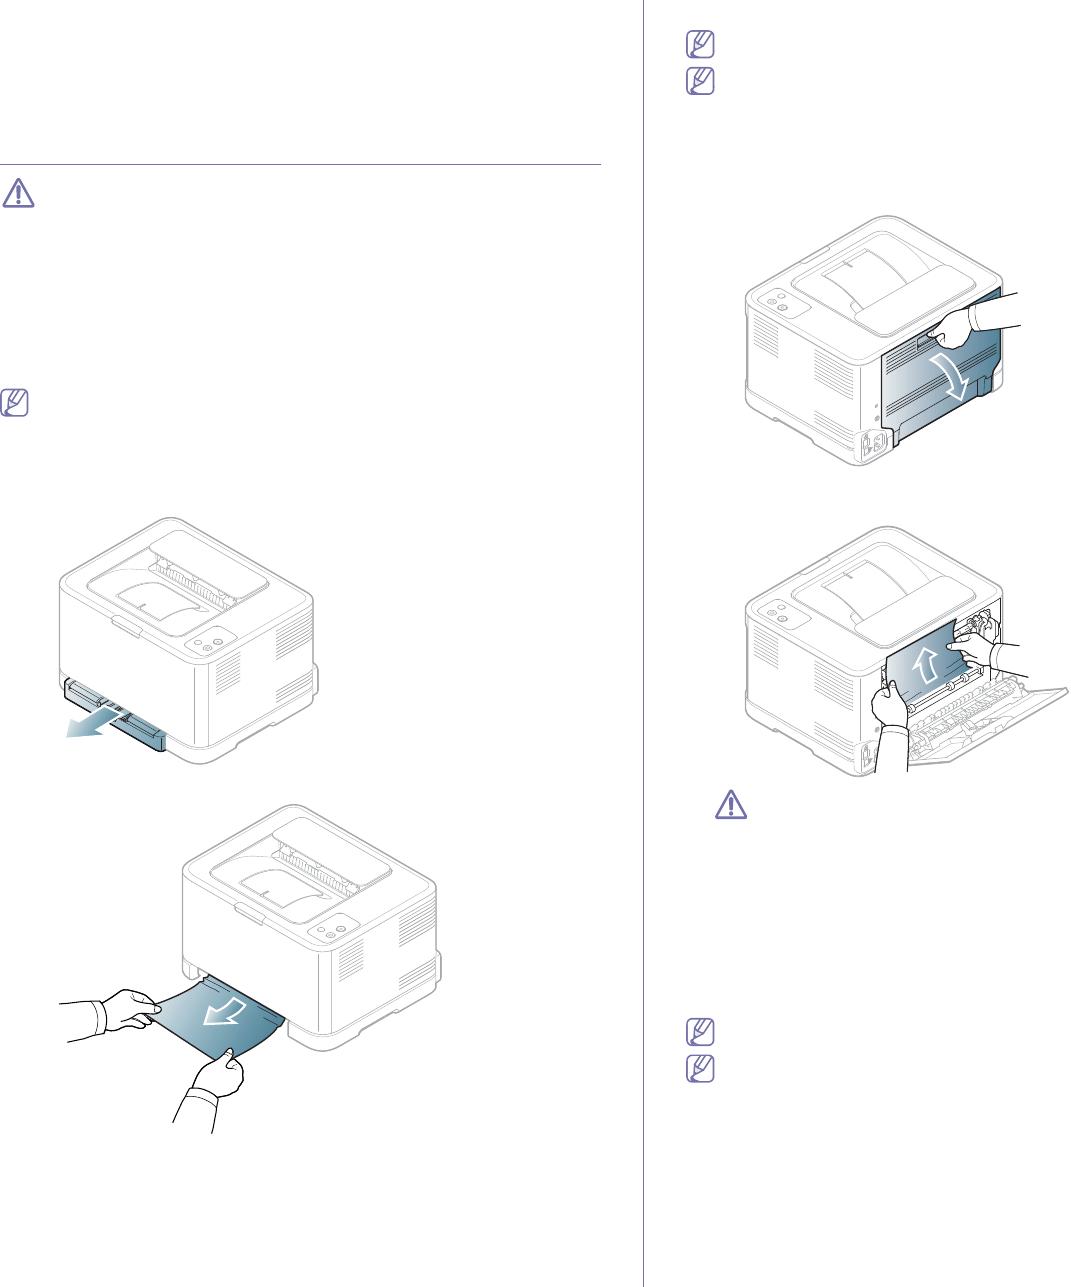 Samsung CLP-320, CLP-325W Clearing paper jams